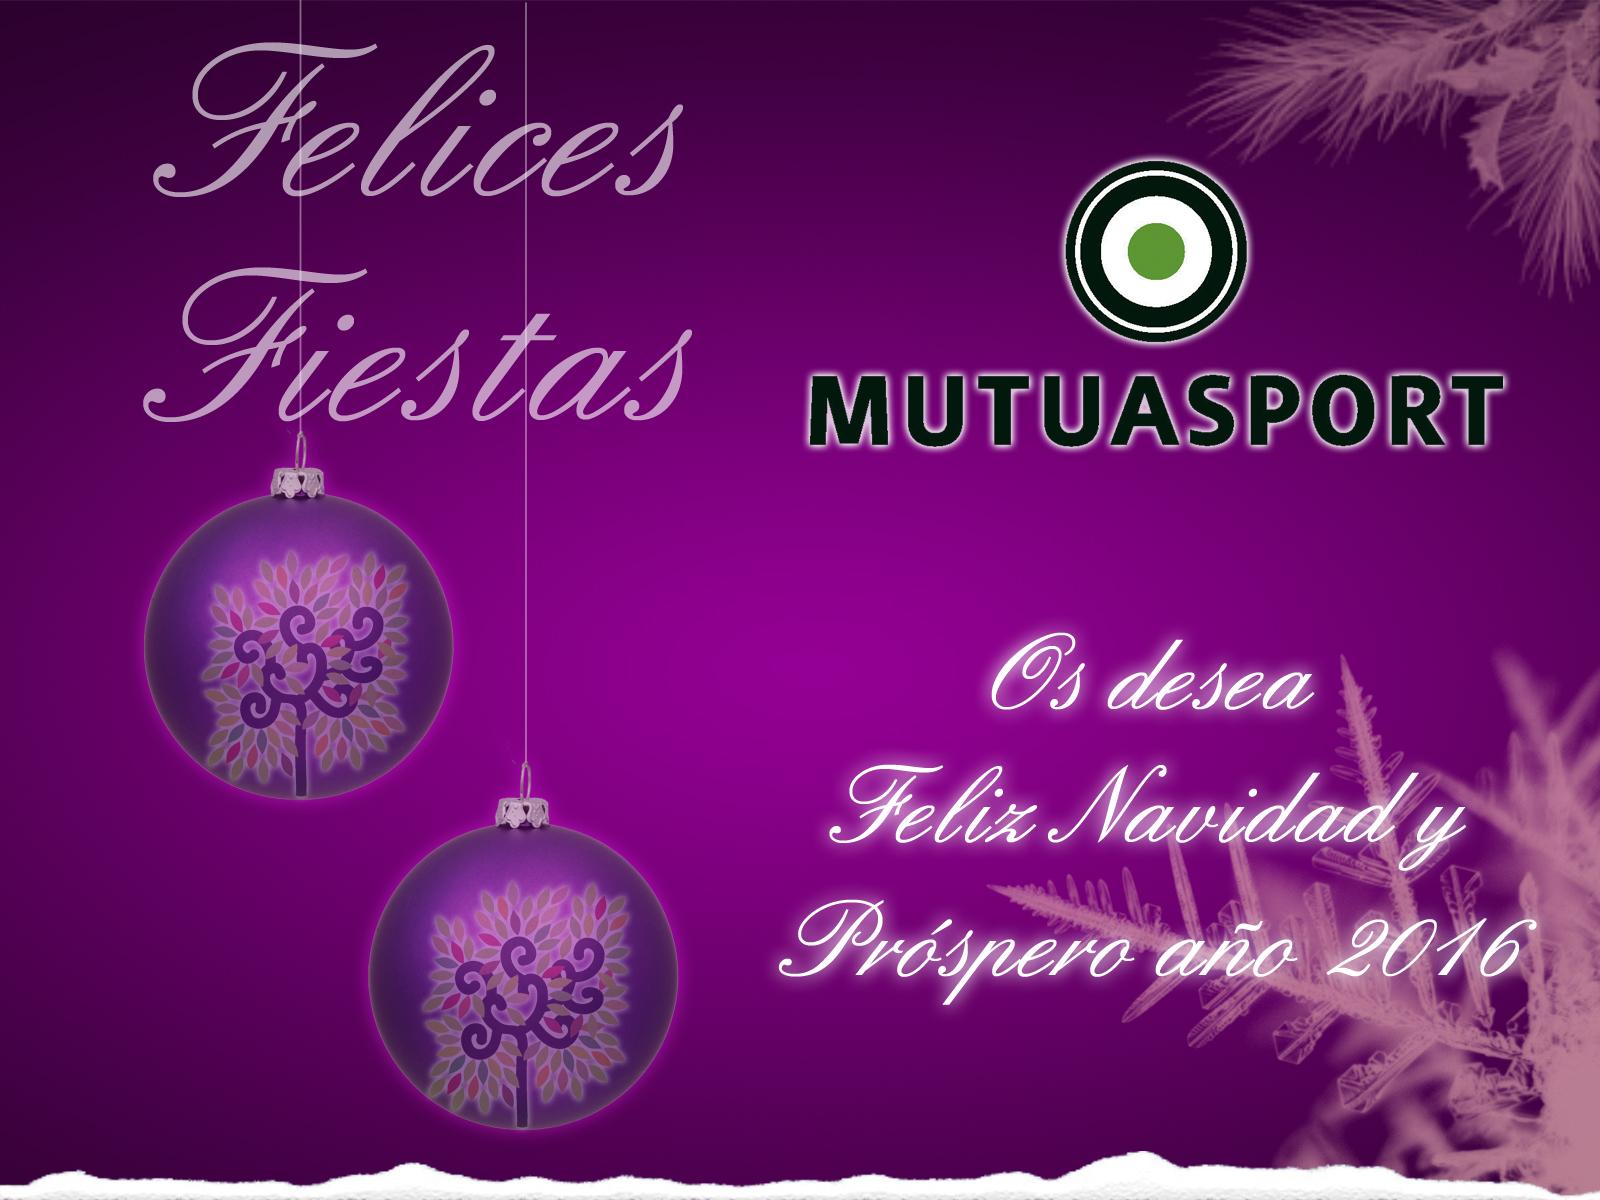 MUTUASPORT os desea Felices Fiestas